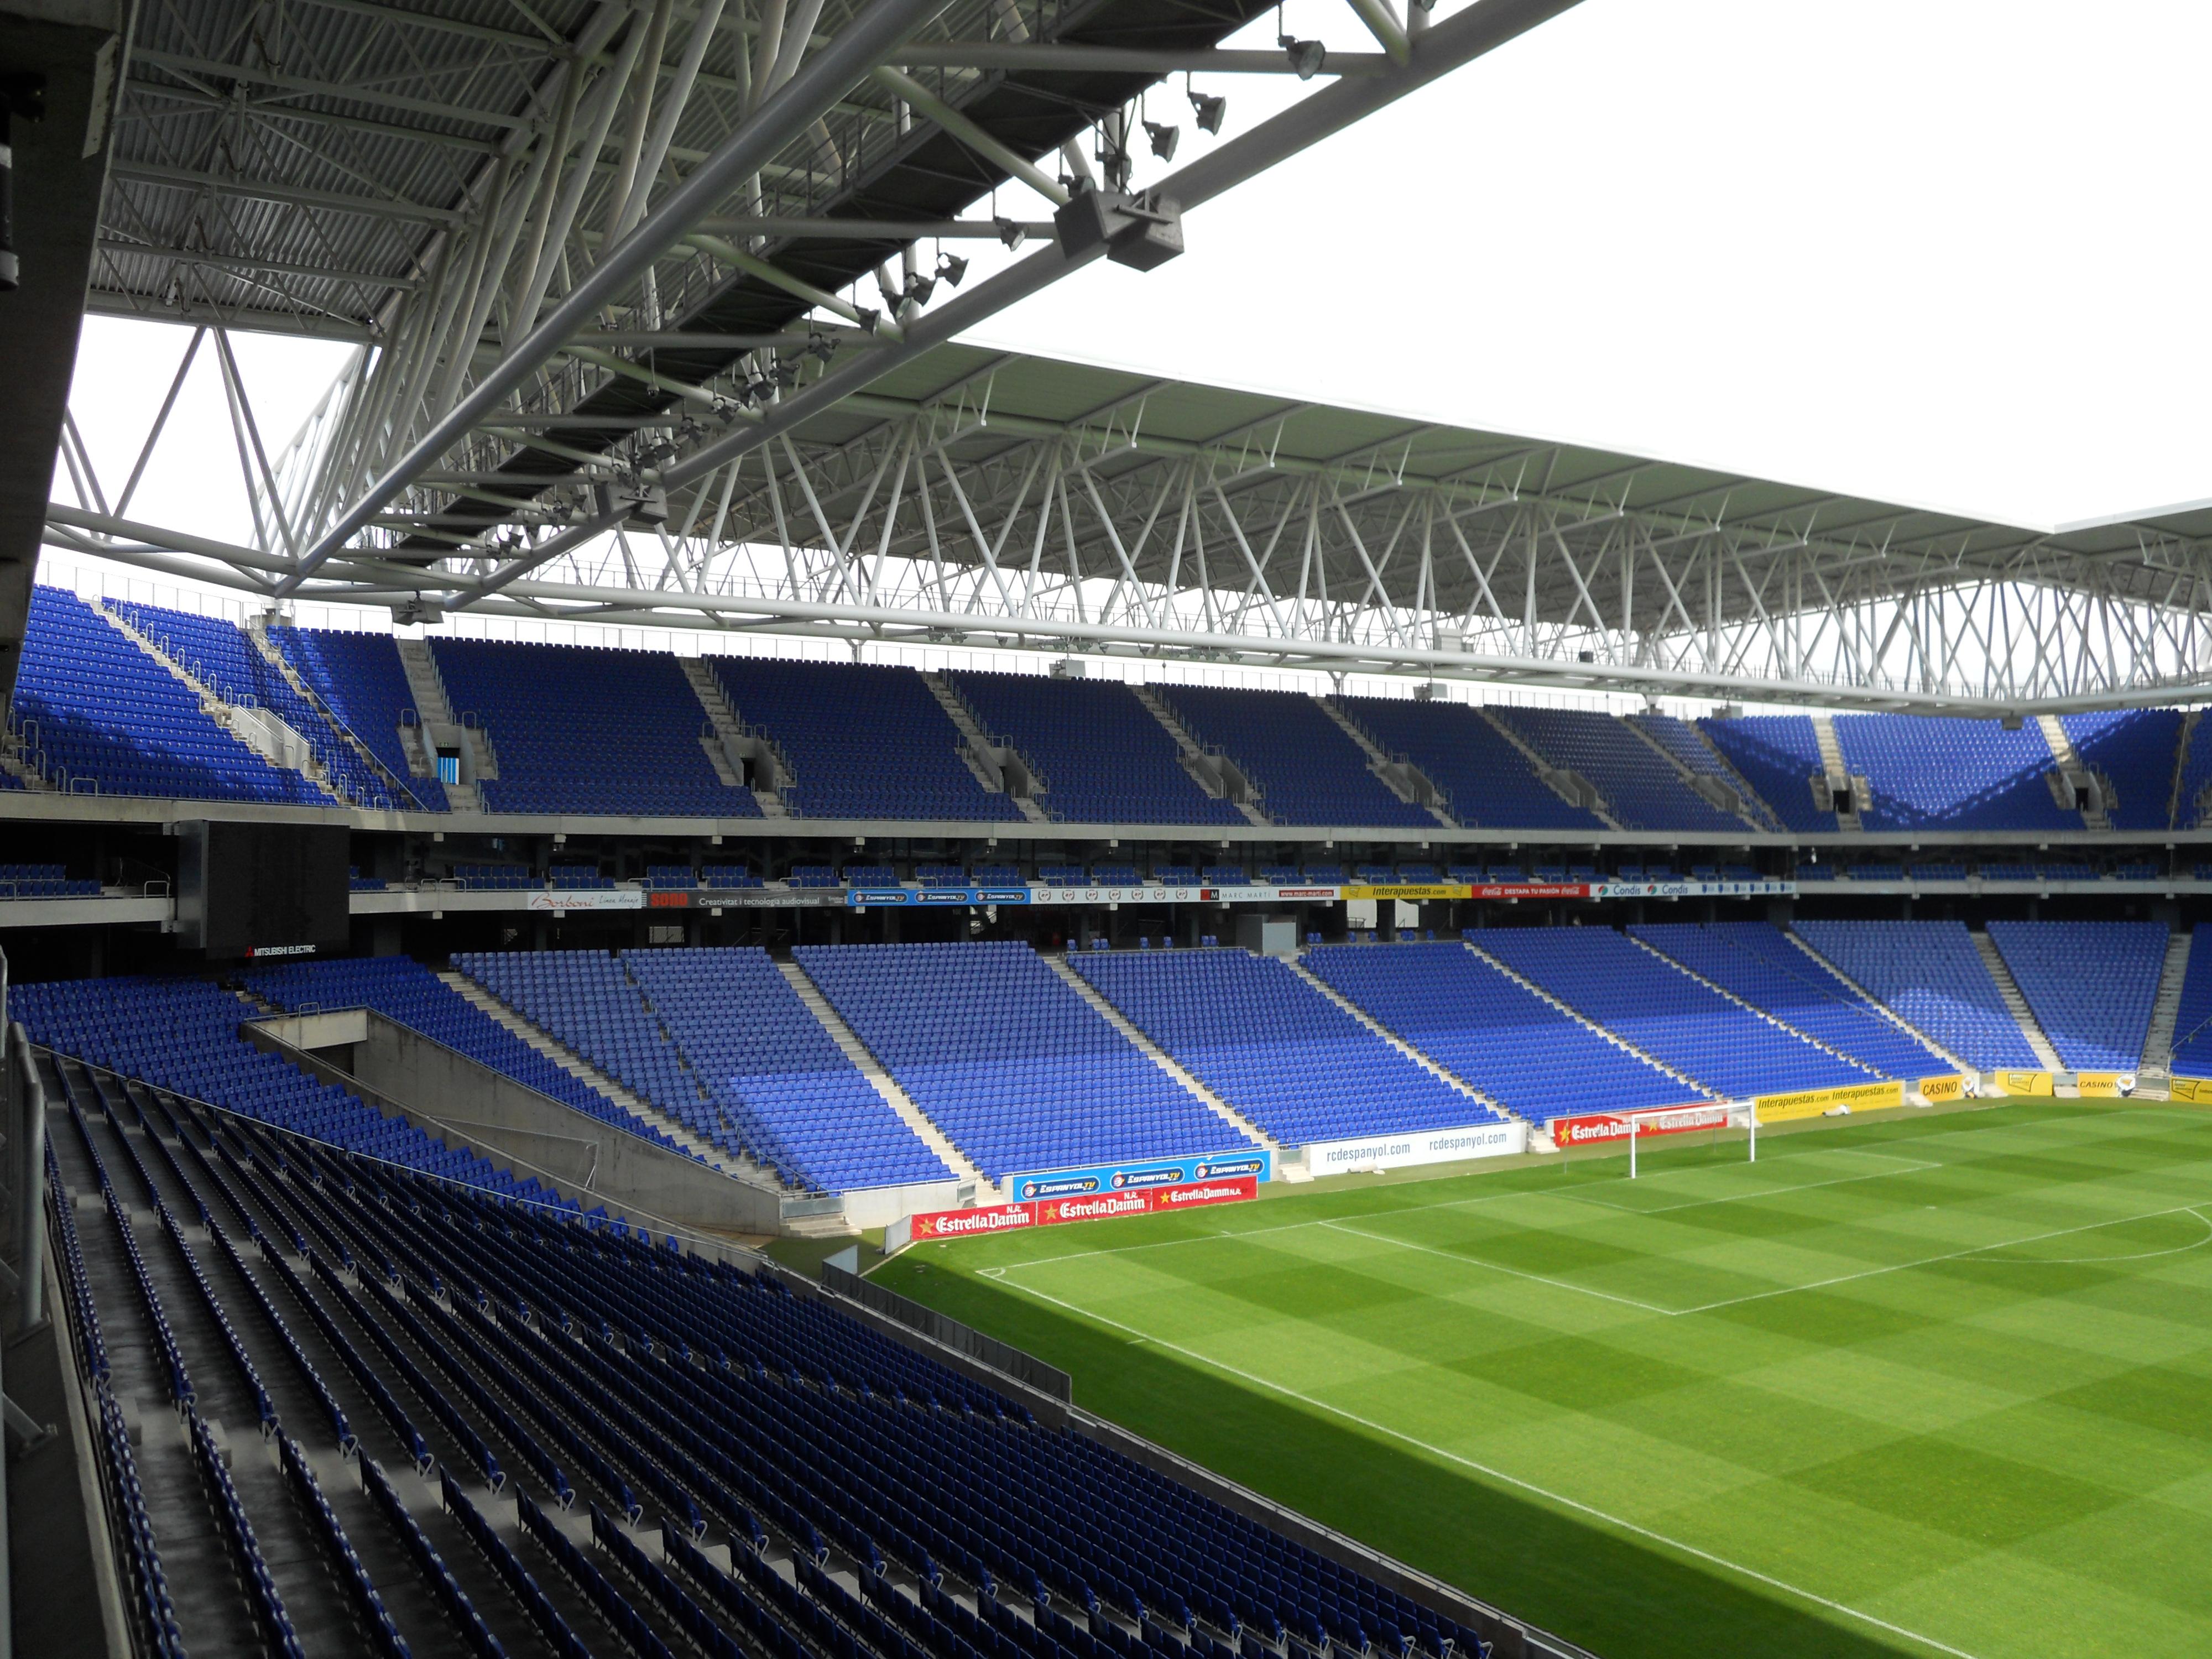 Rcde Stadium O Moderno Estadio Do Espanyol Fut Pop Clube